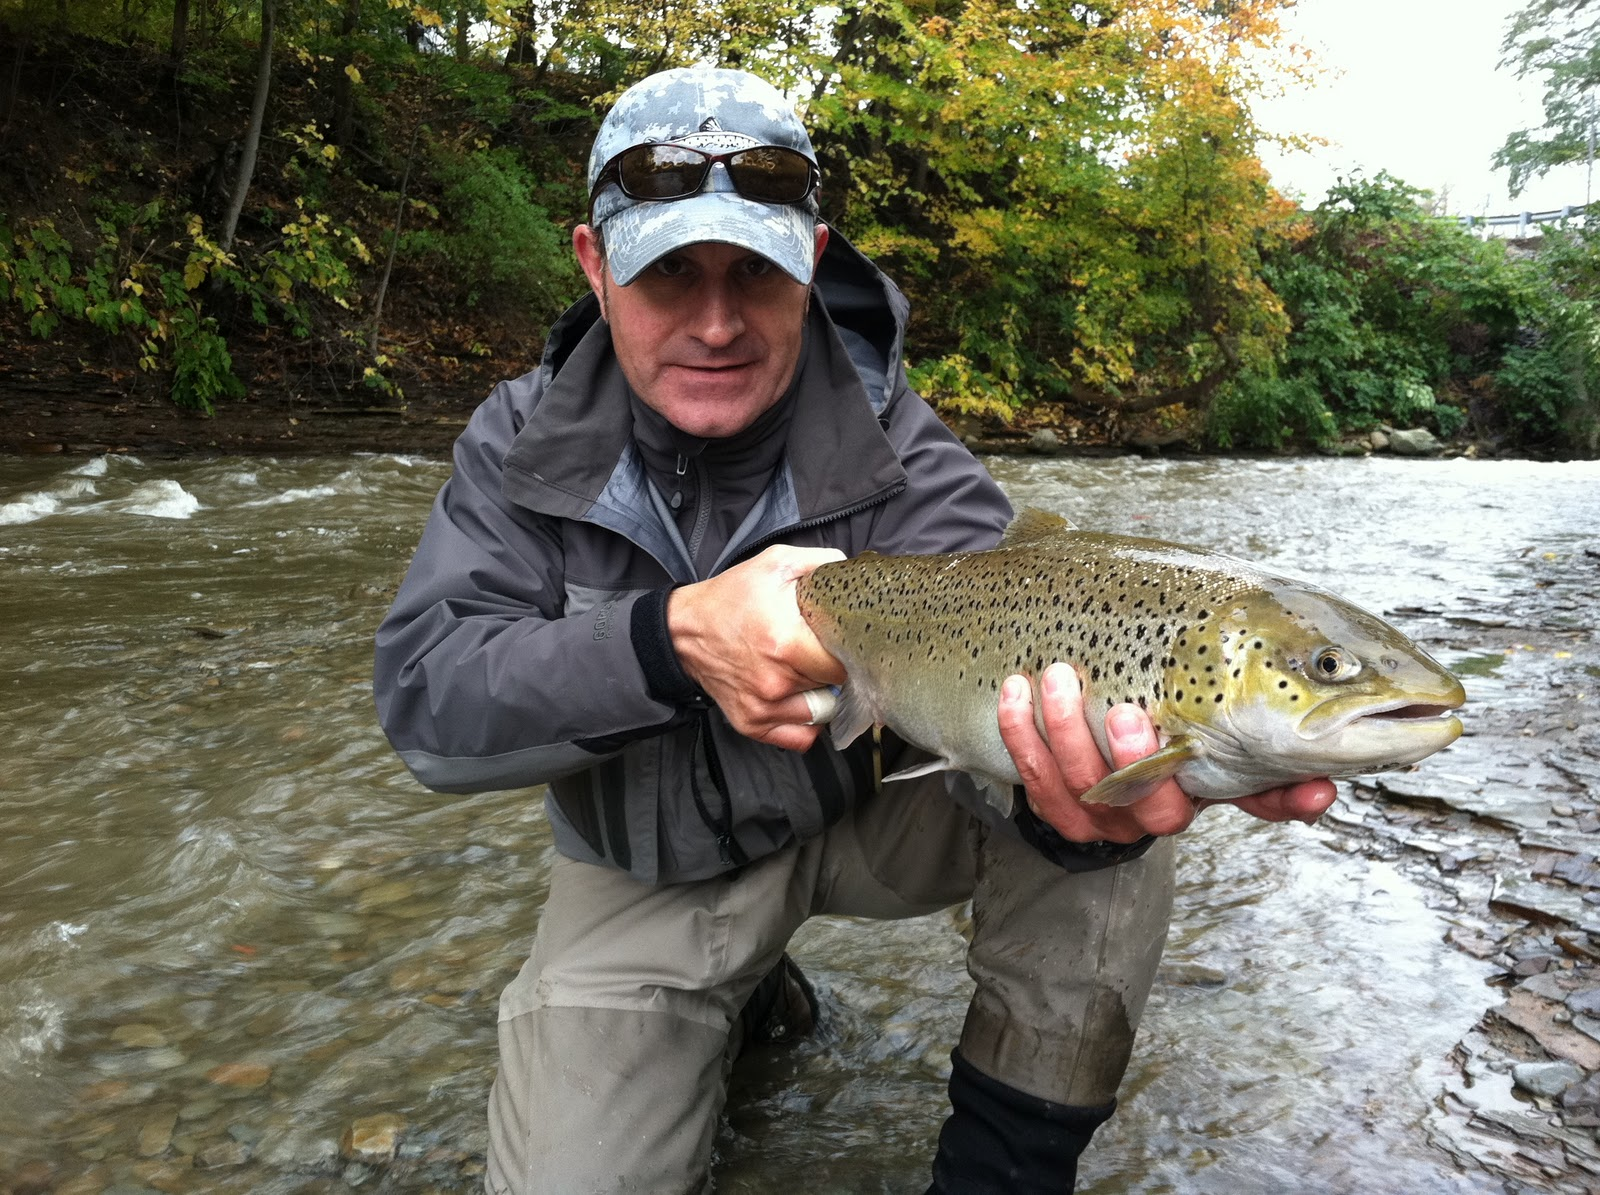 North western pennsylvania fly fishing october 2011 for Steelhead fishing pa